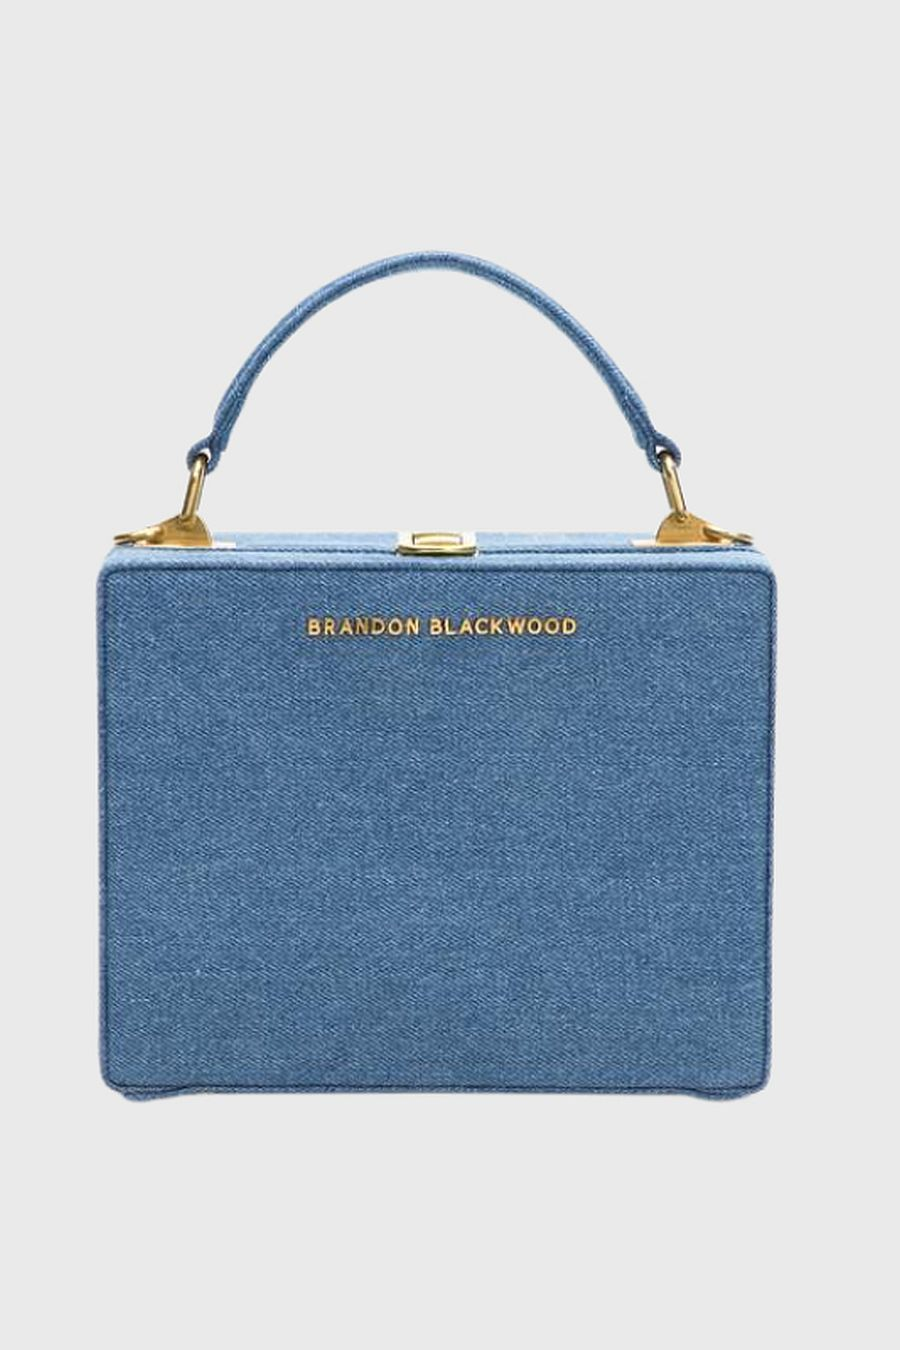 Brandon Blackwood Kendrick Trunk - 90s Blue Denim